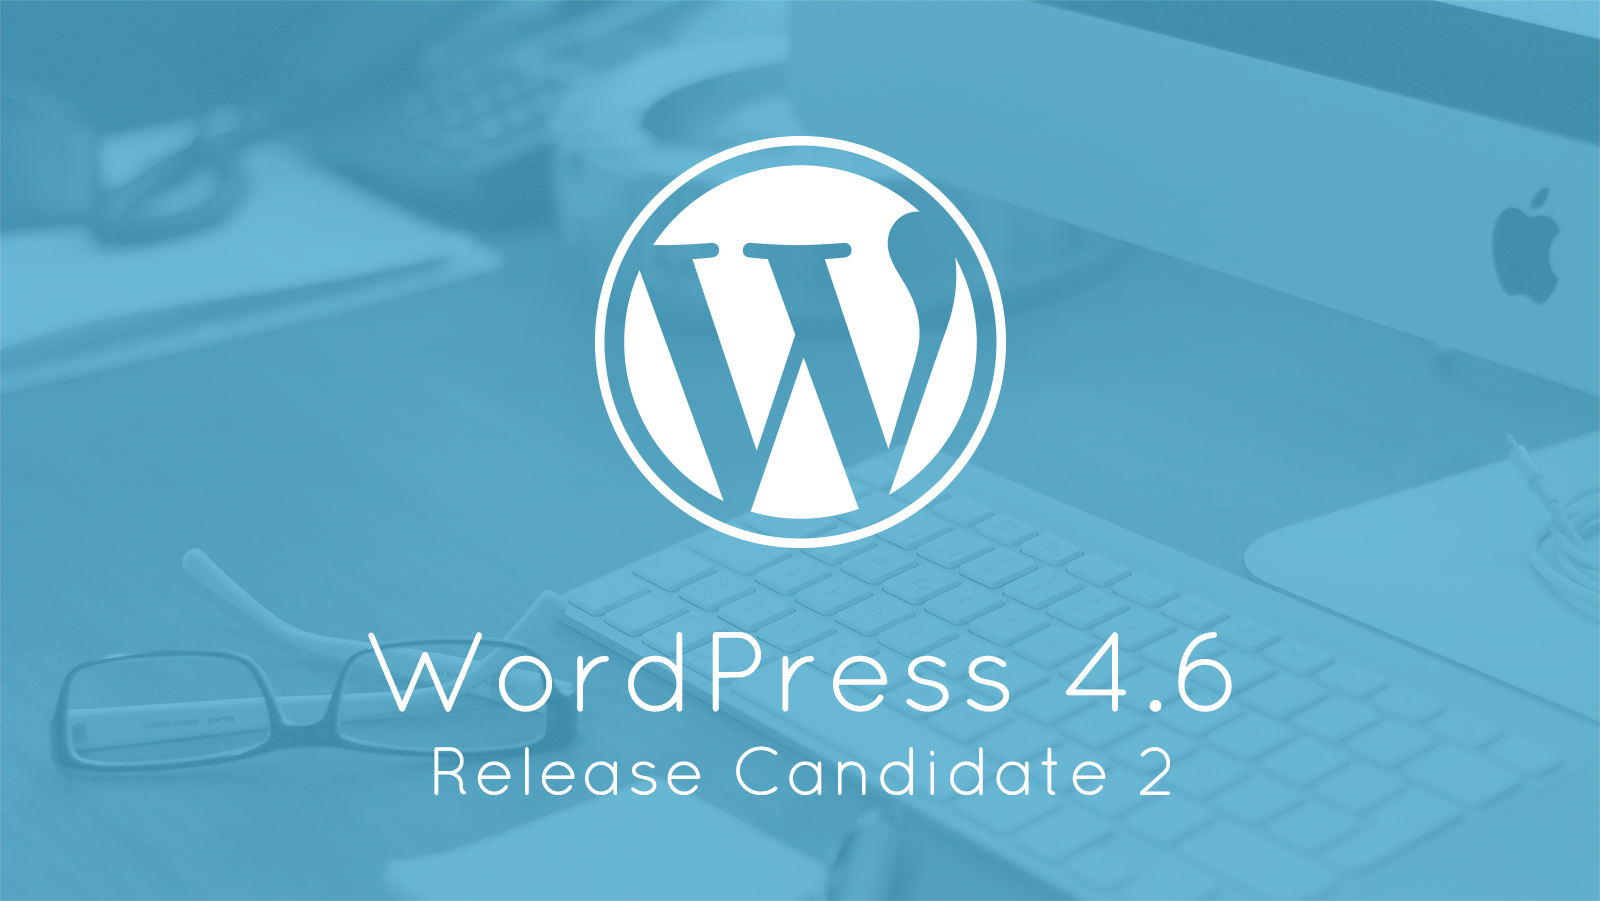 WordPress 4.6 Release Candidate 2